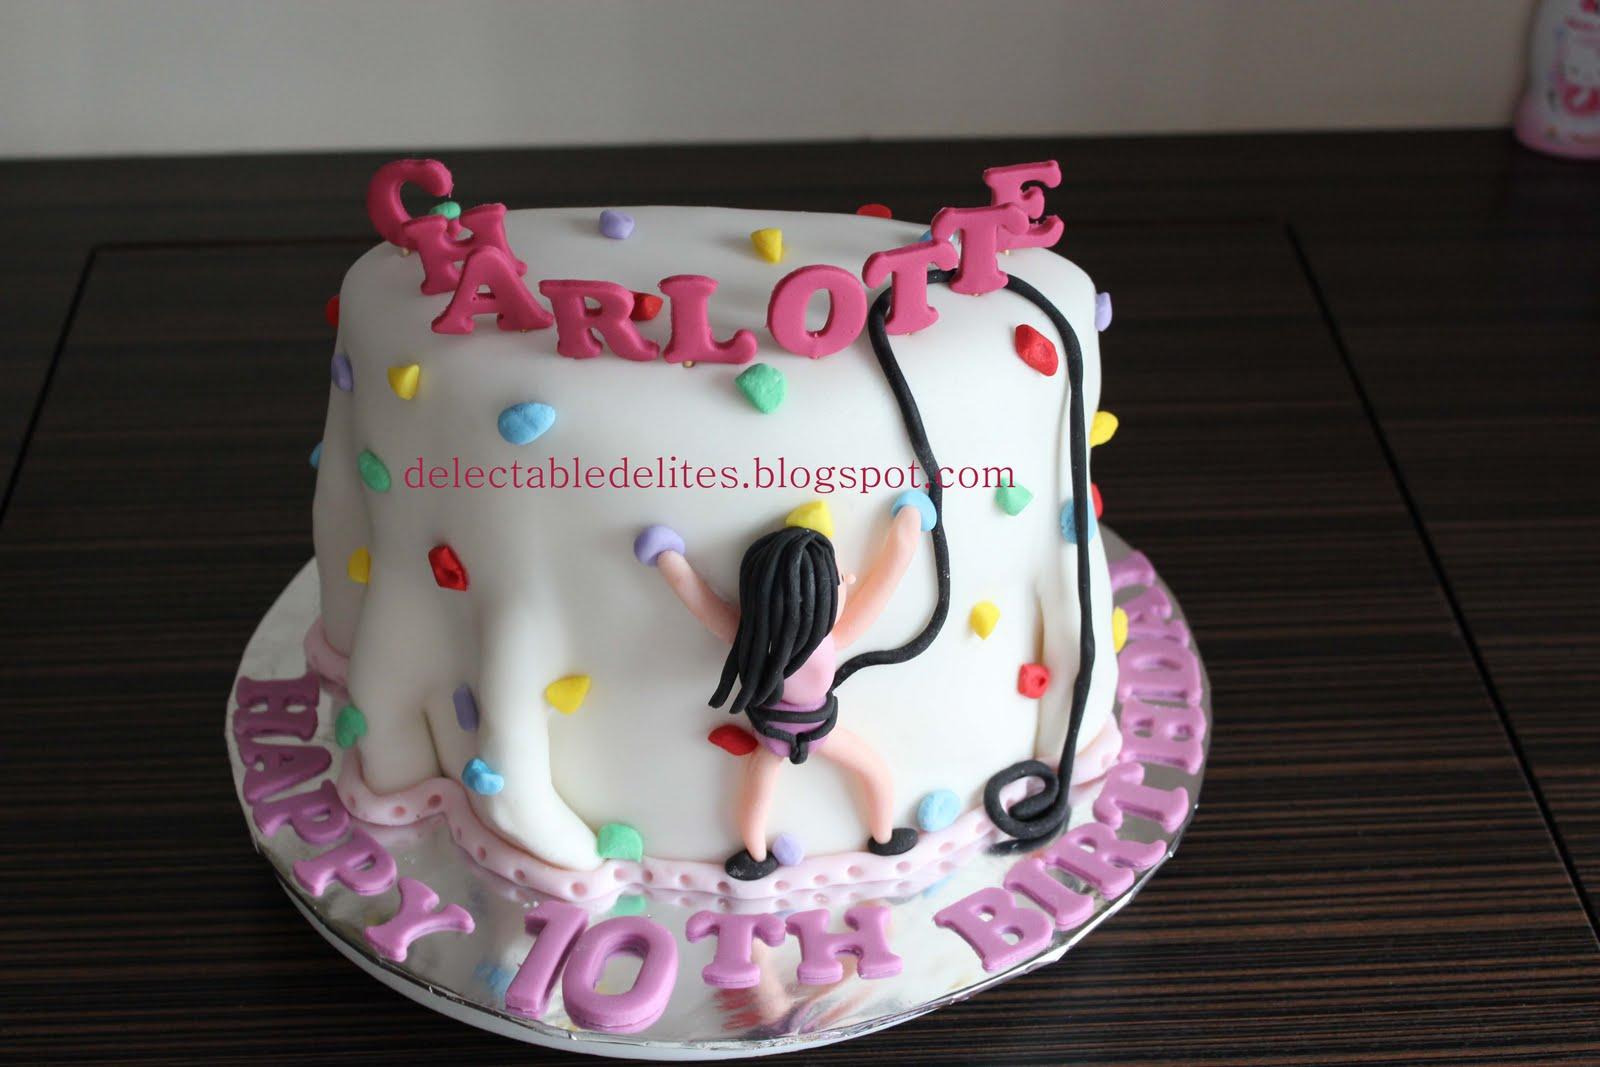 Delectable Delites Rock Climbing Cake